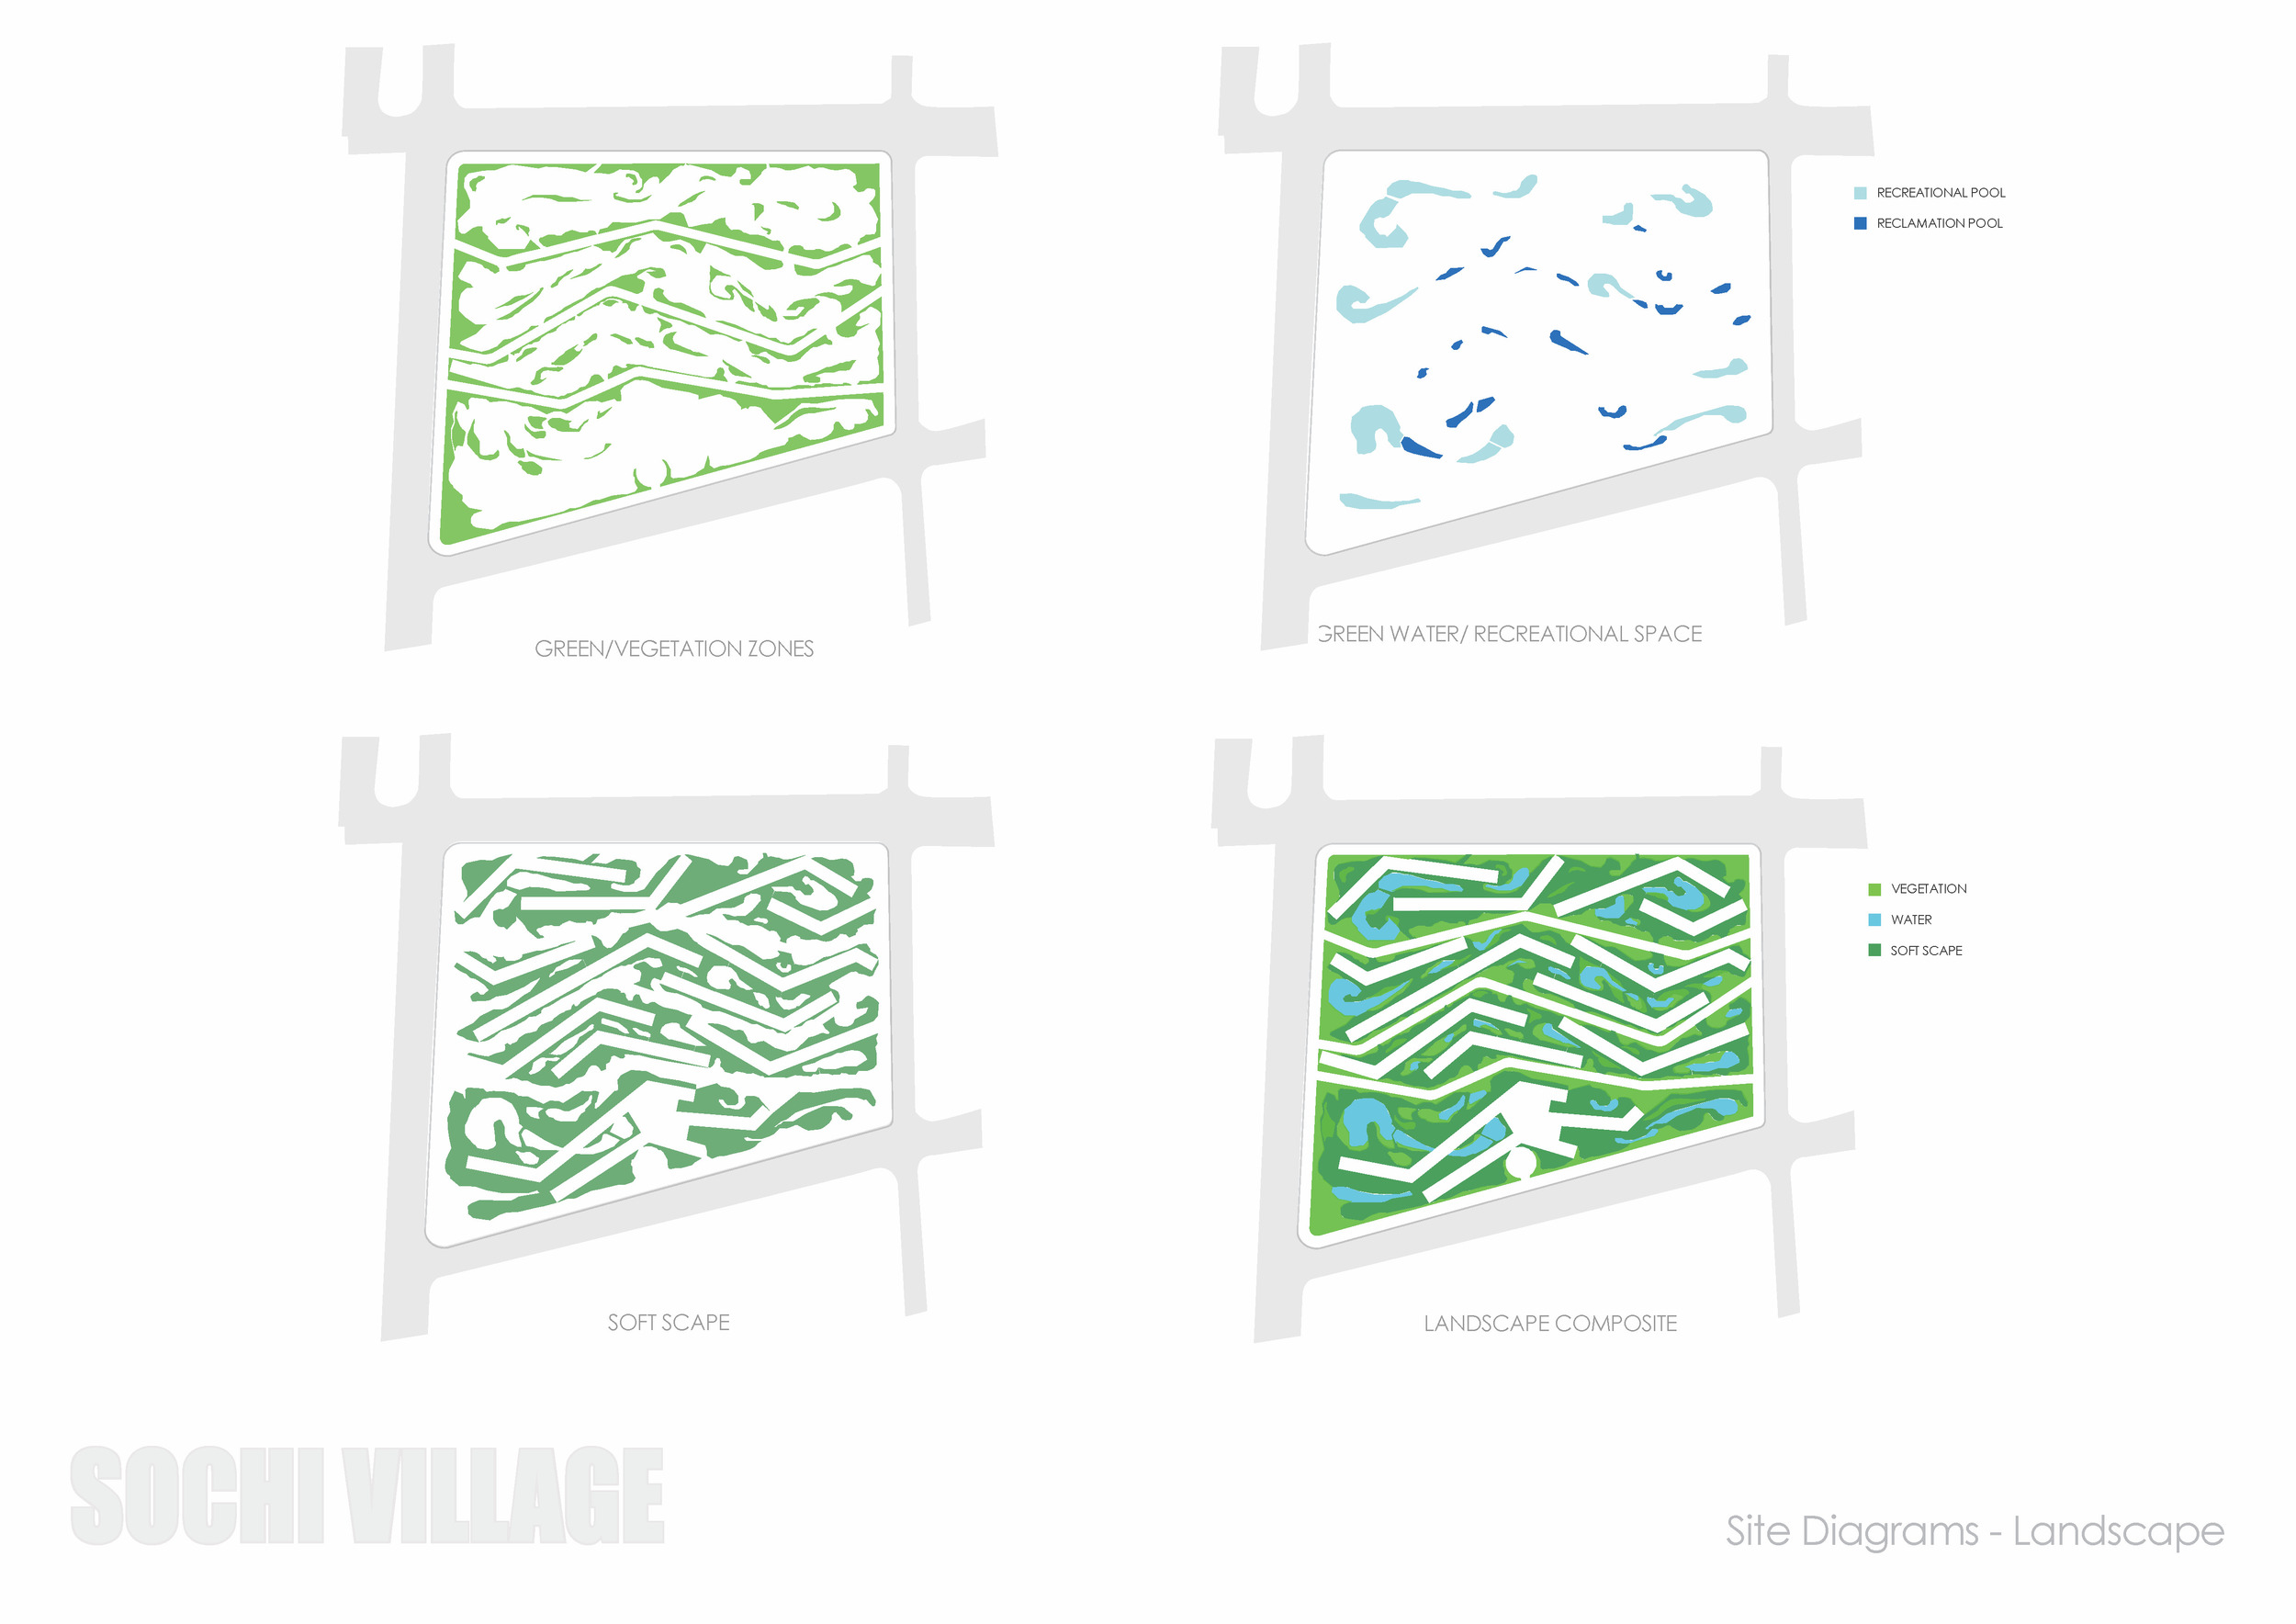 Sochi Olympic Village Site Diagrams - Landscape